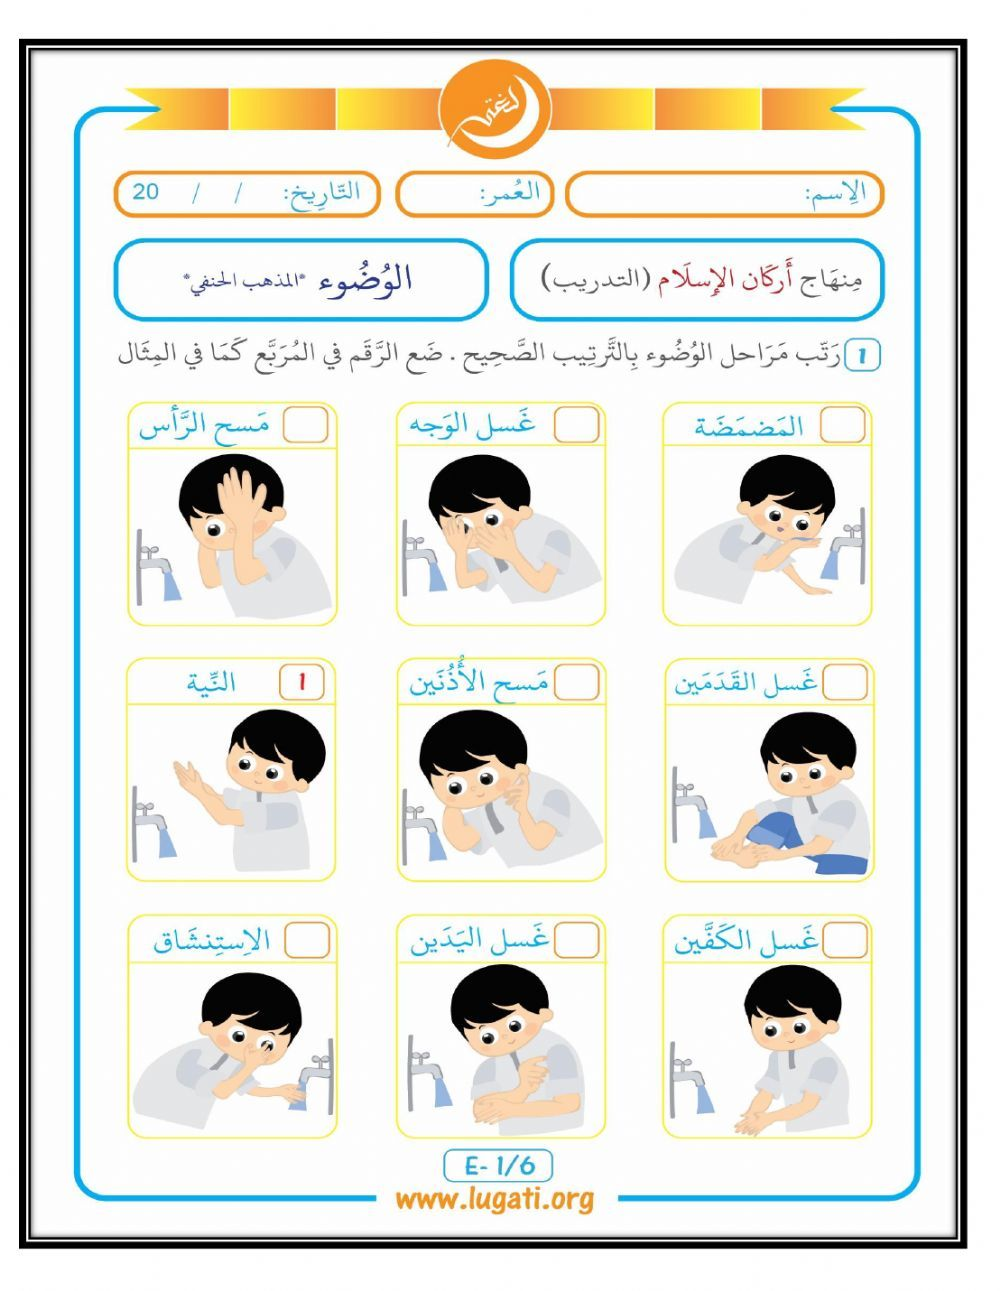 إسلامية Interactive And Downloadable Worksheet You Can Do The Exercises Online Or Download The W Learning Arabic For Beginners Learning Arabic Online Workouts